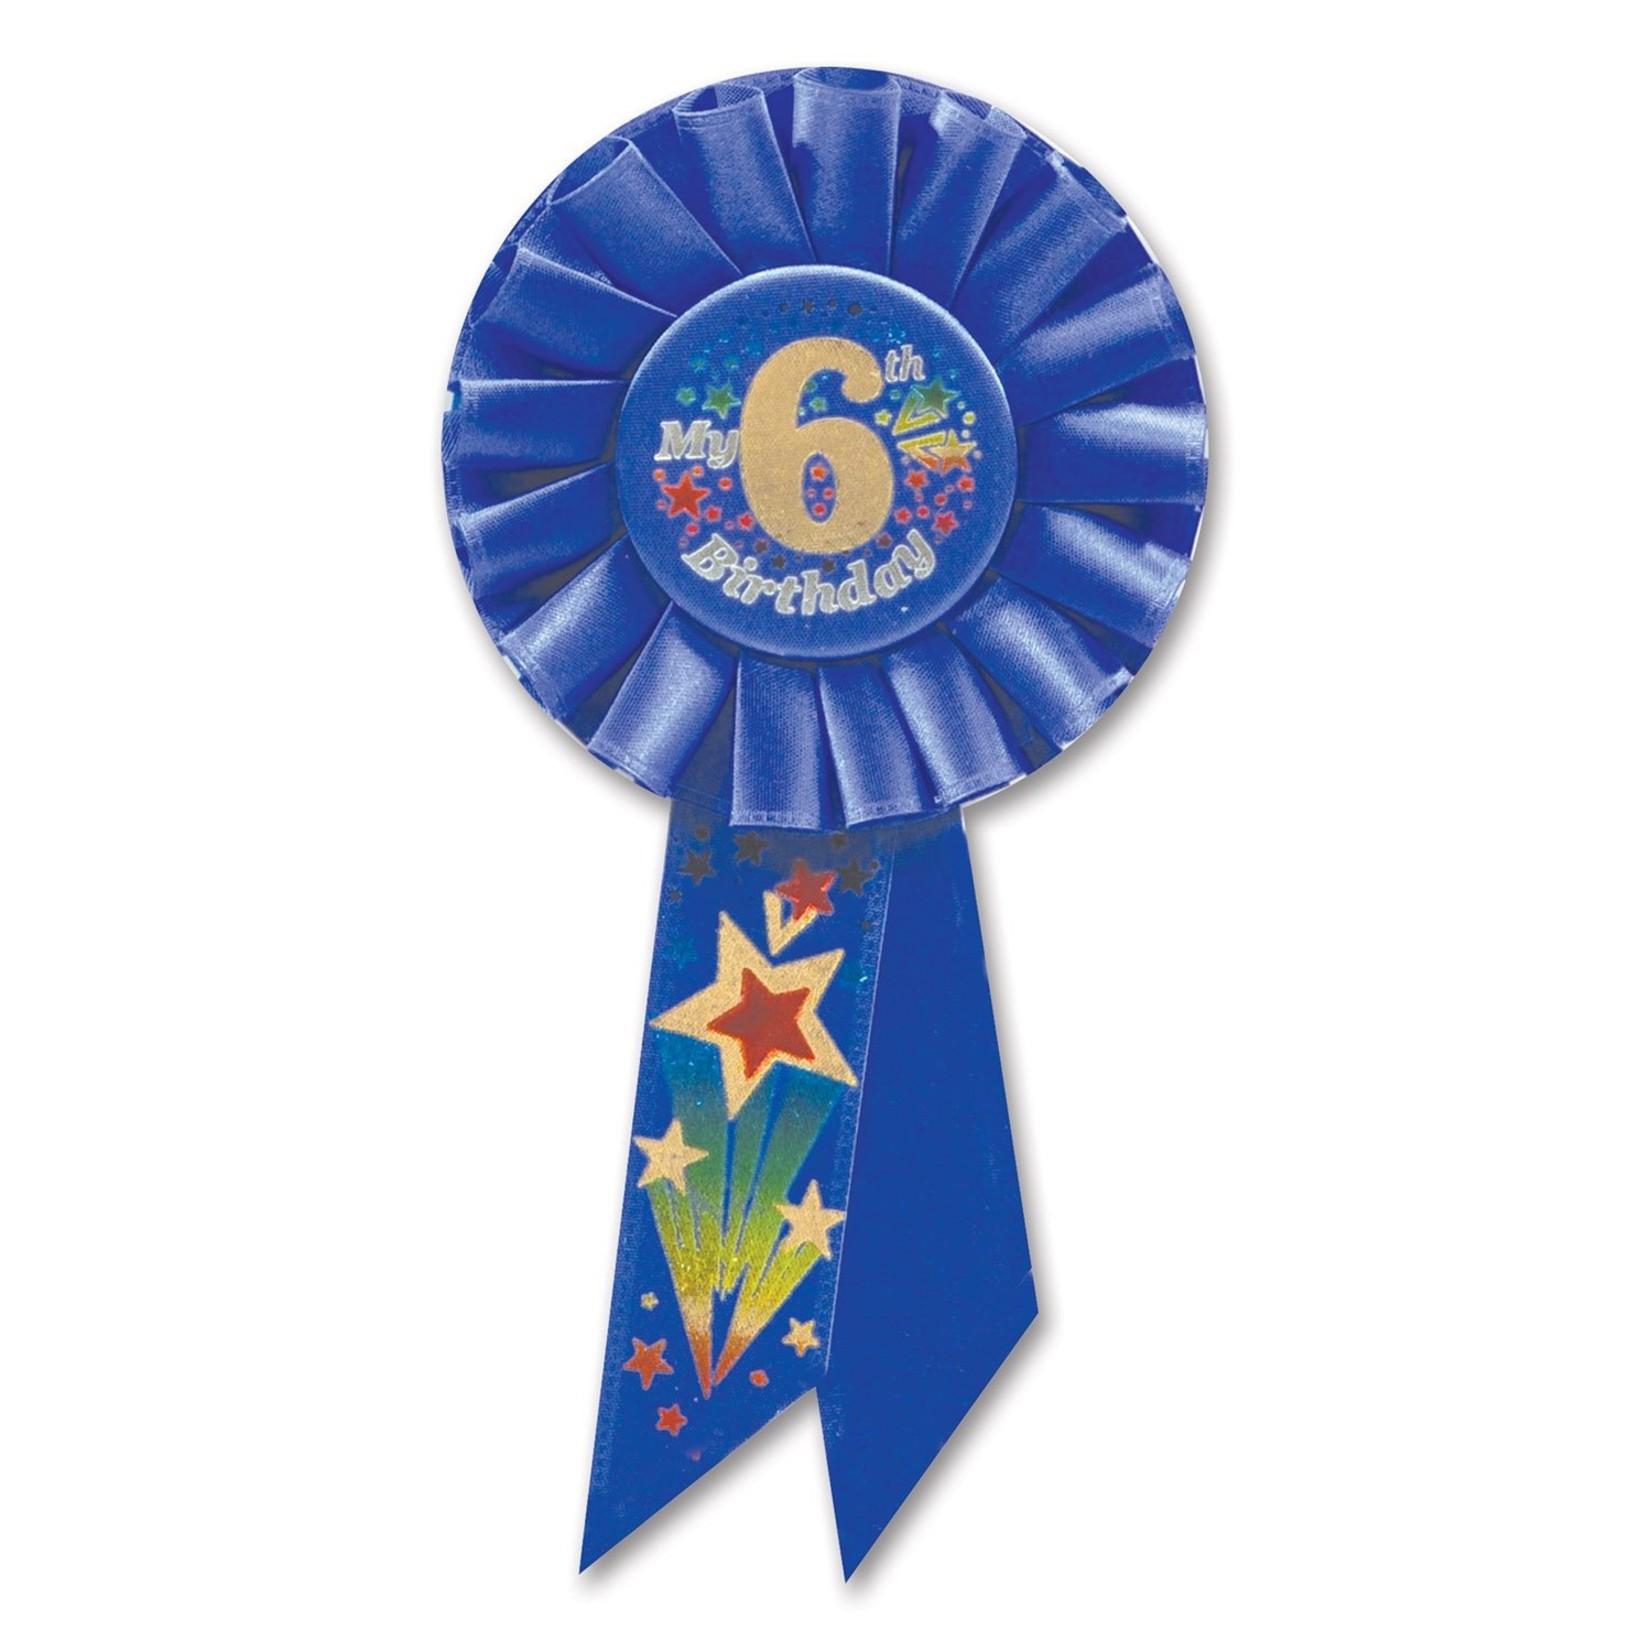 Award Ribbon - My 6th Birthday